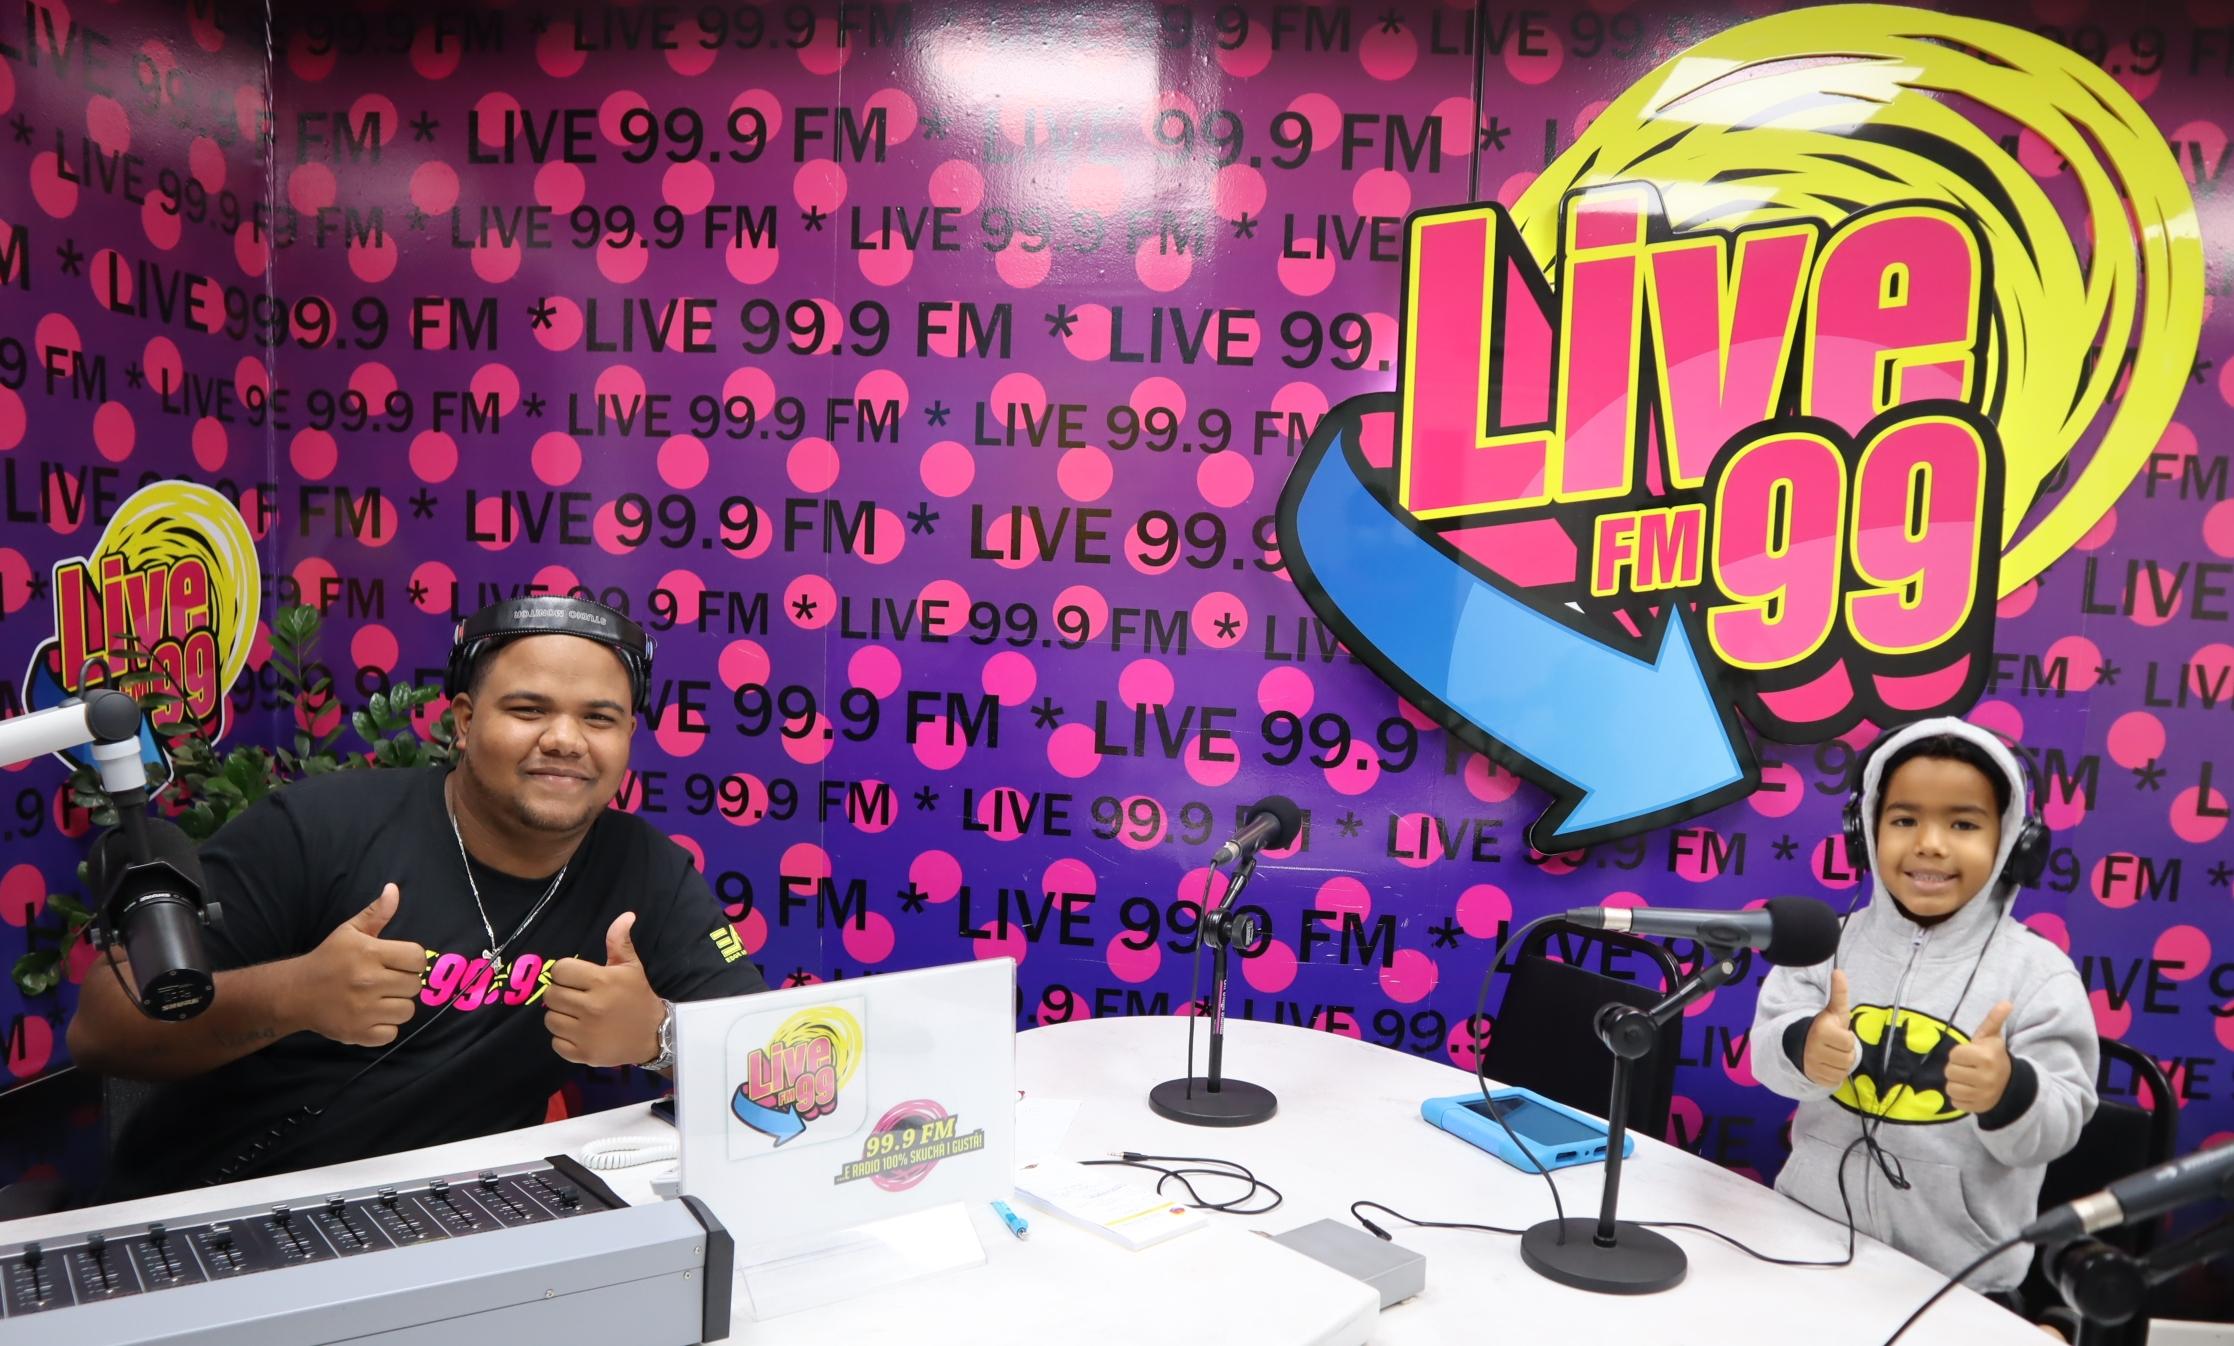 XIANO WILLEM PROMÉ BIA A KOMUNIKÁ KU OYENTENAN DI RADIO LIVE99.9 FM